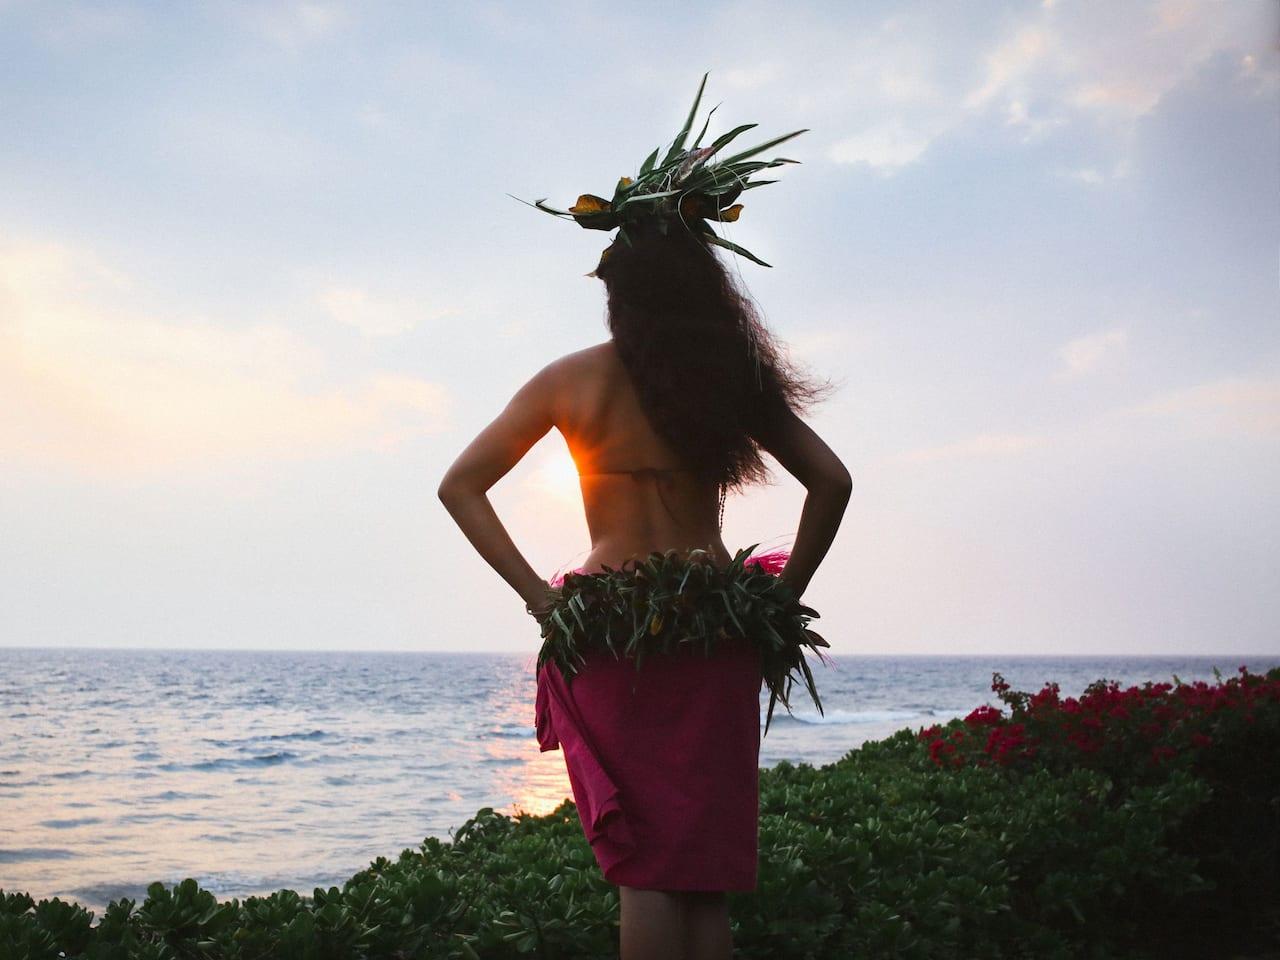 Woman performing at a Luau at Hyatt Regency Resort in Maui